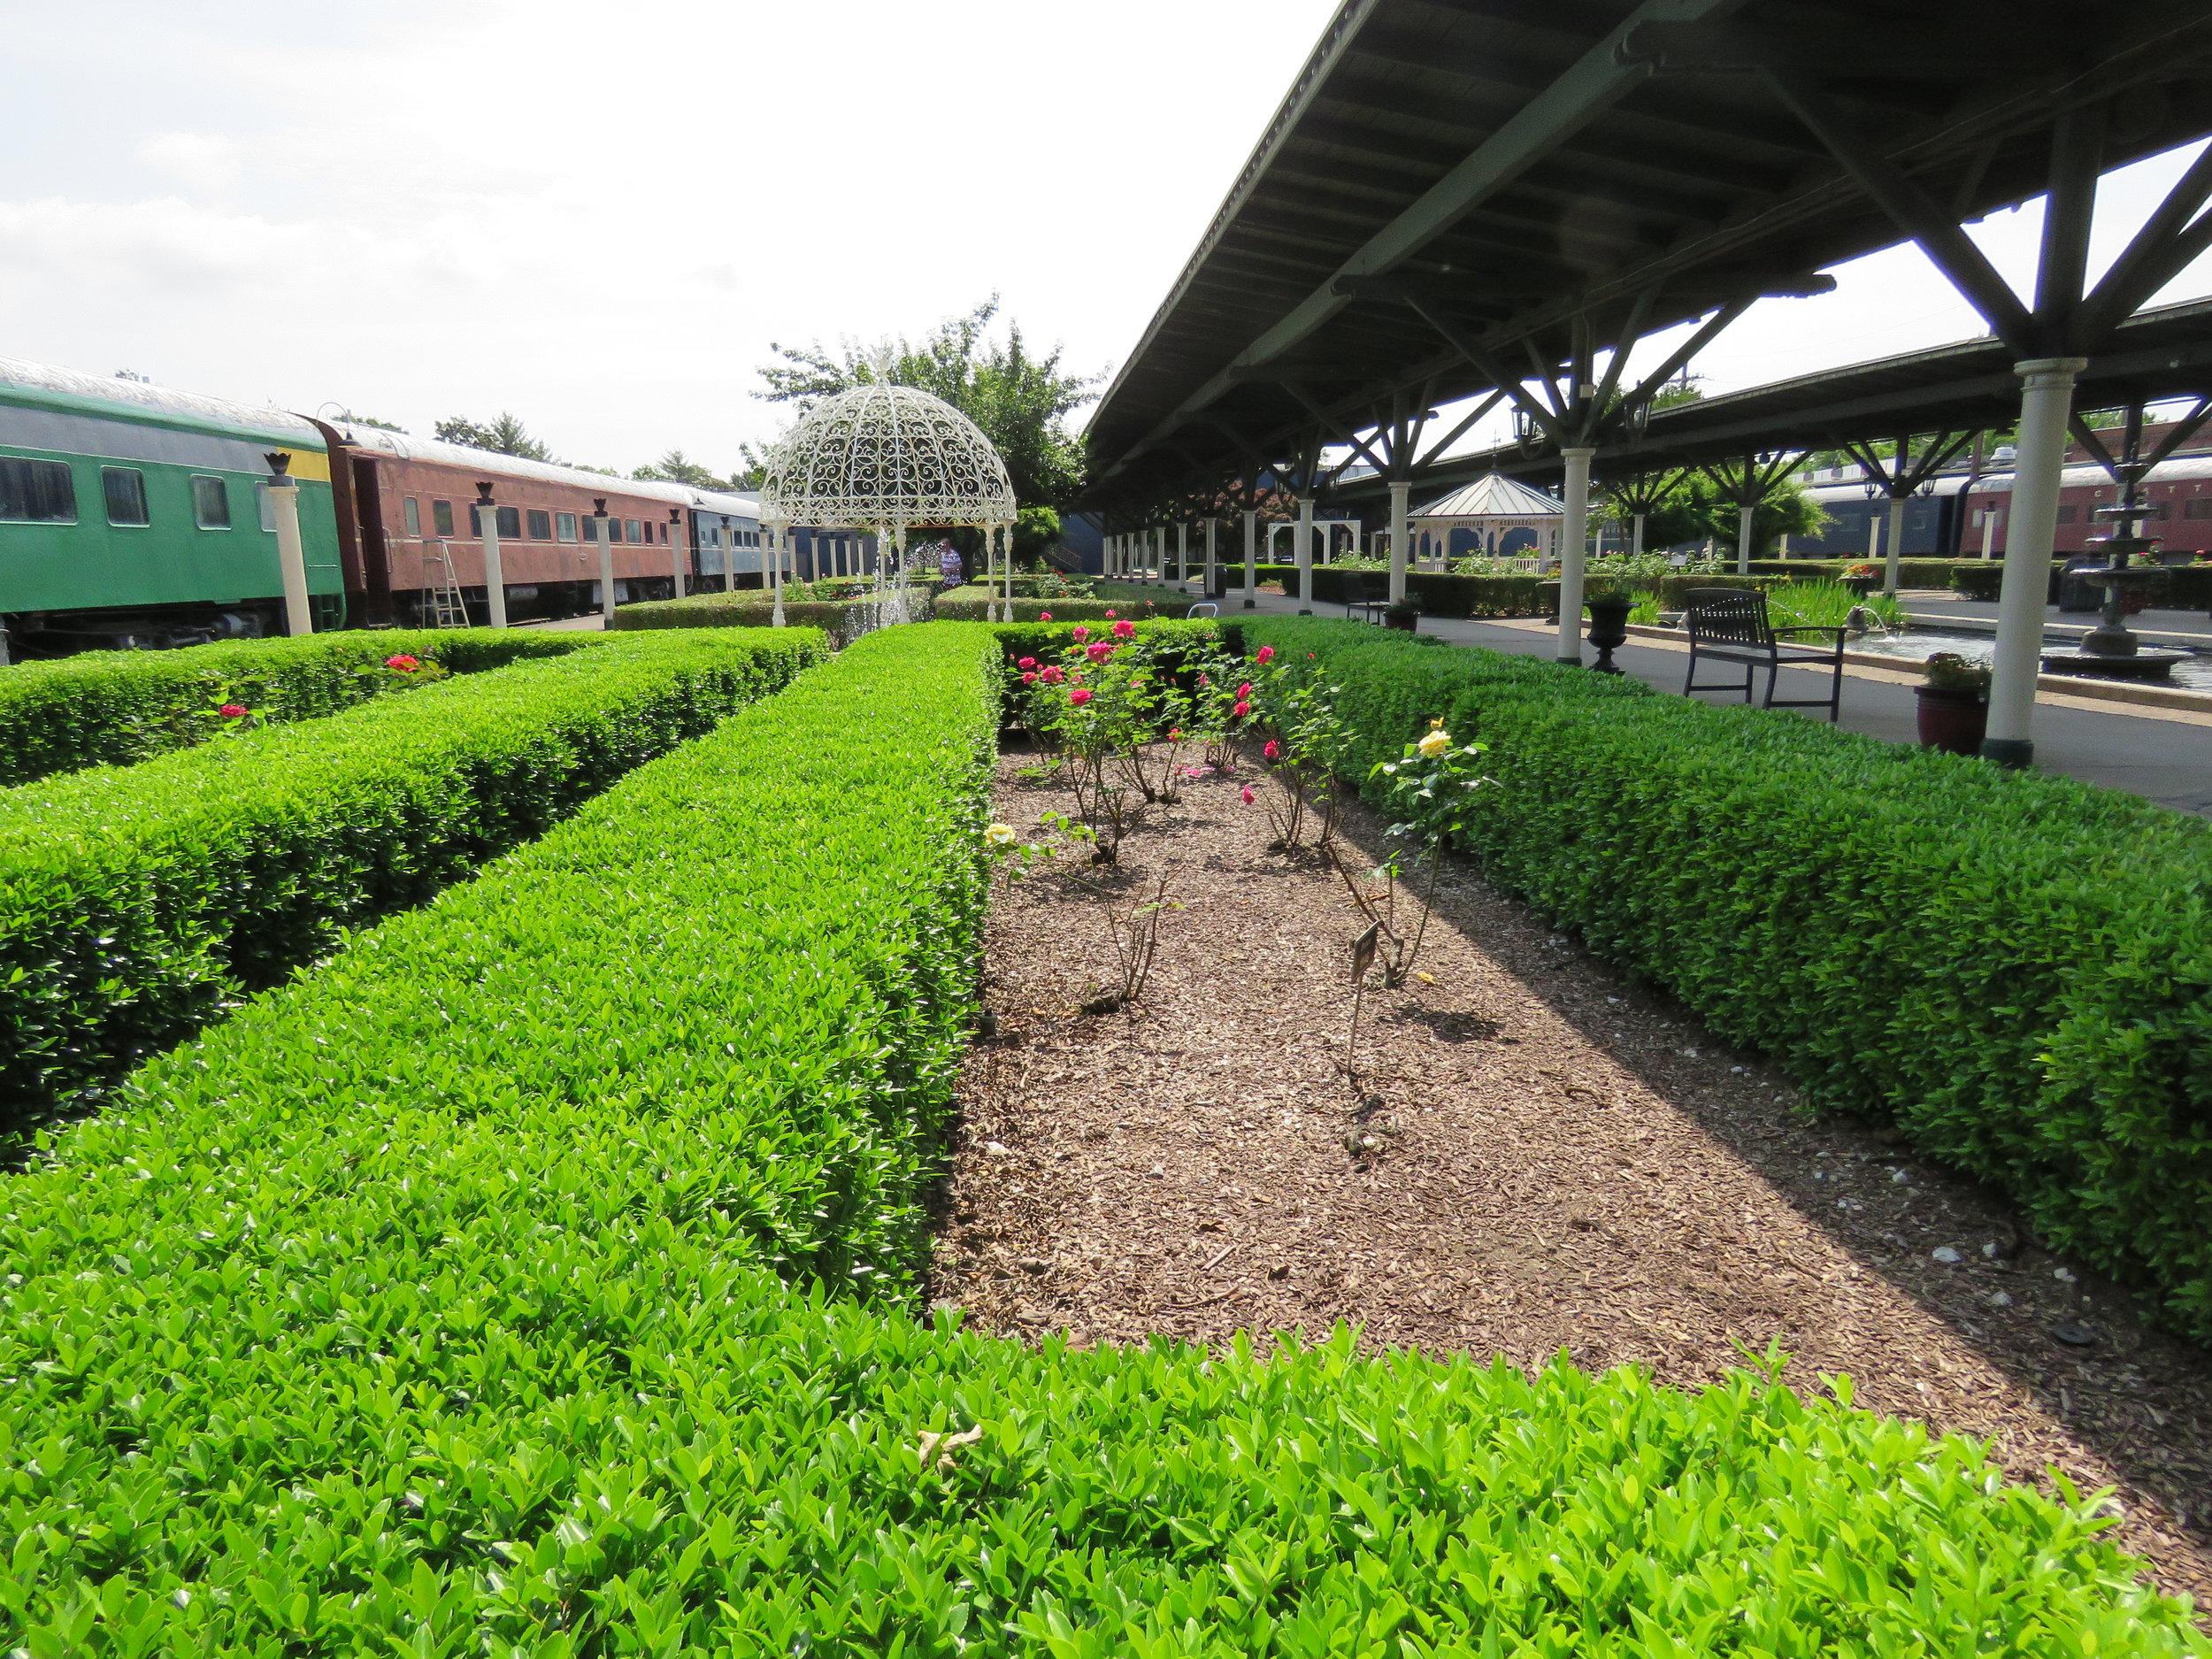 glenn miller gardens near the train cars